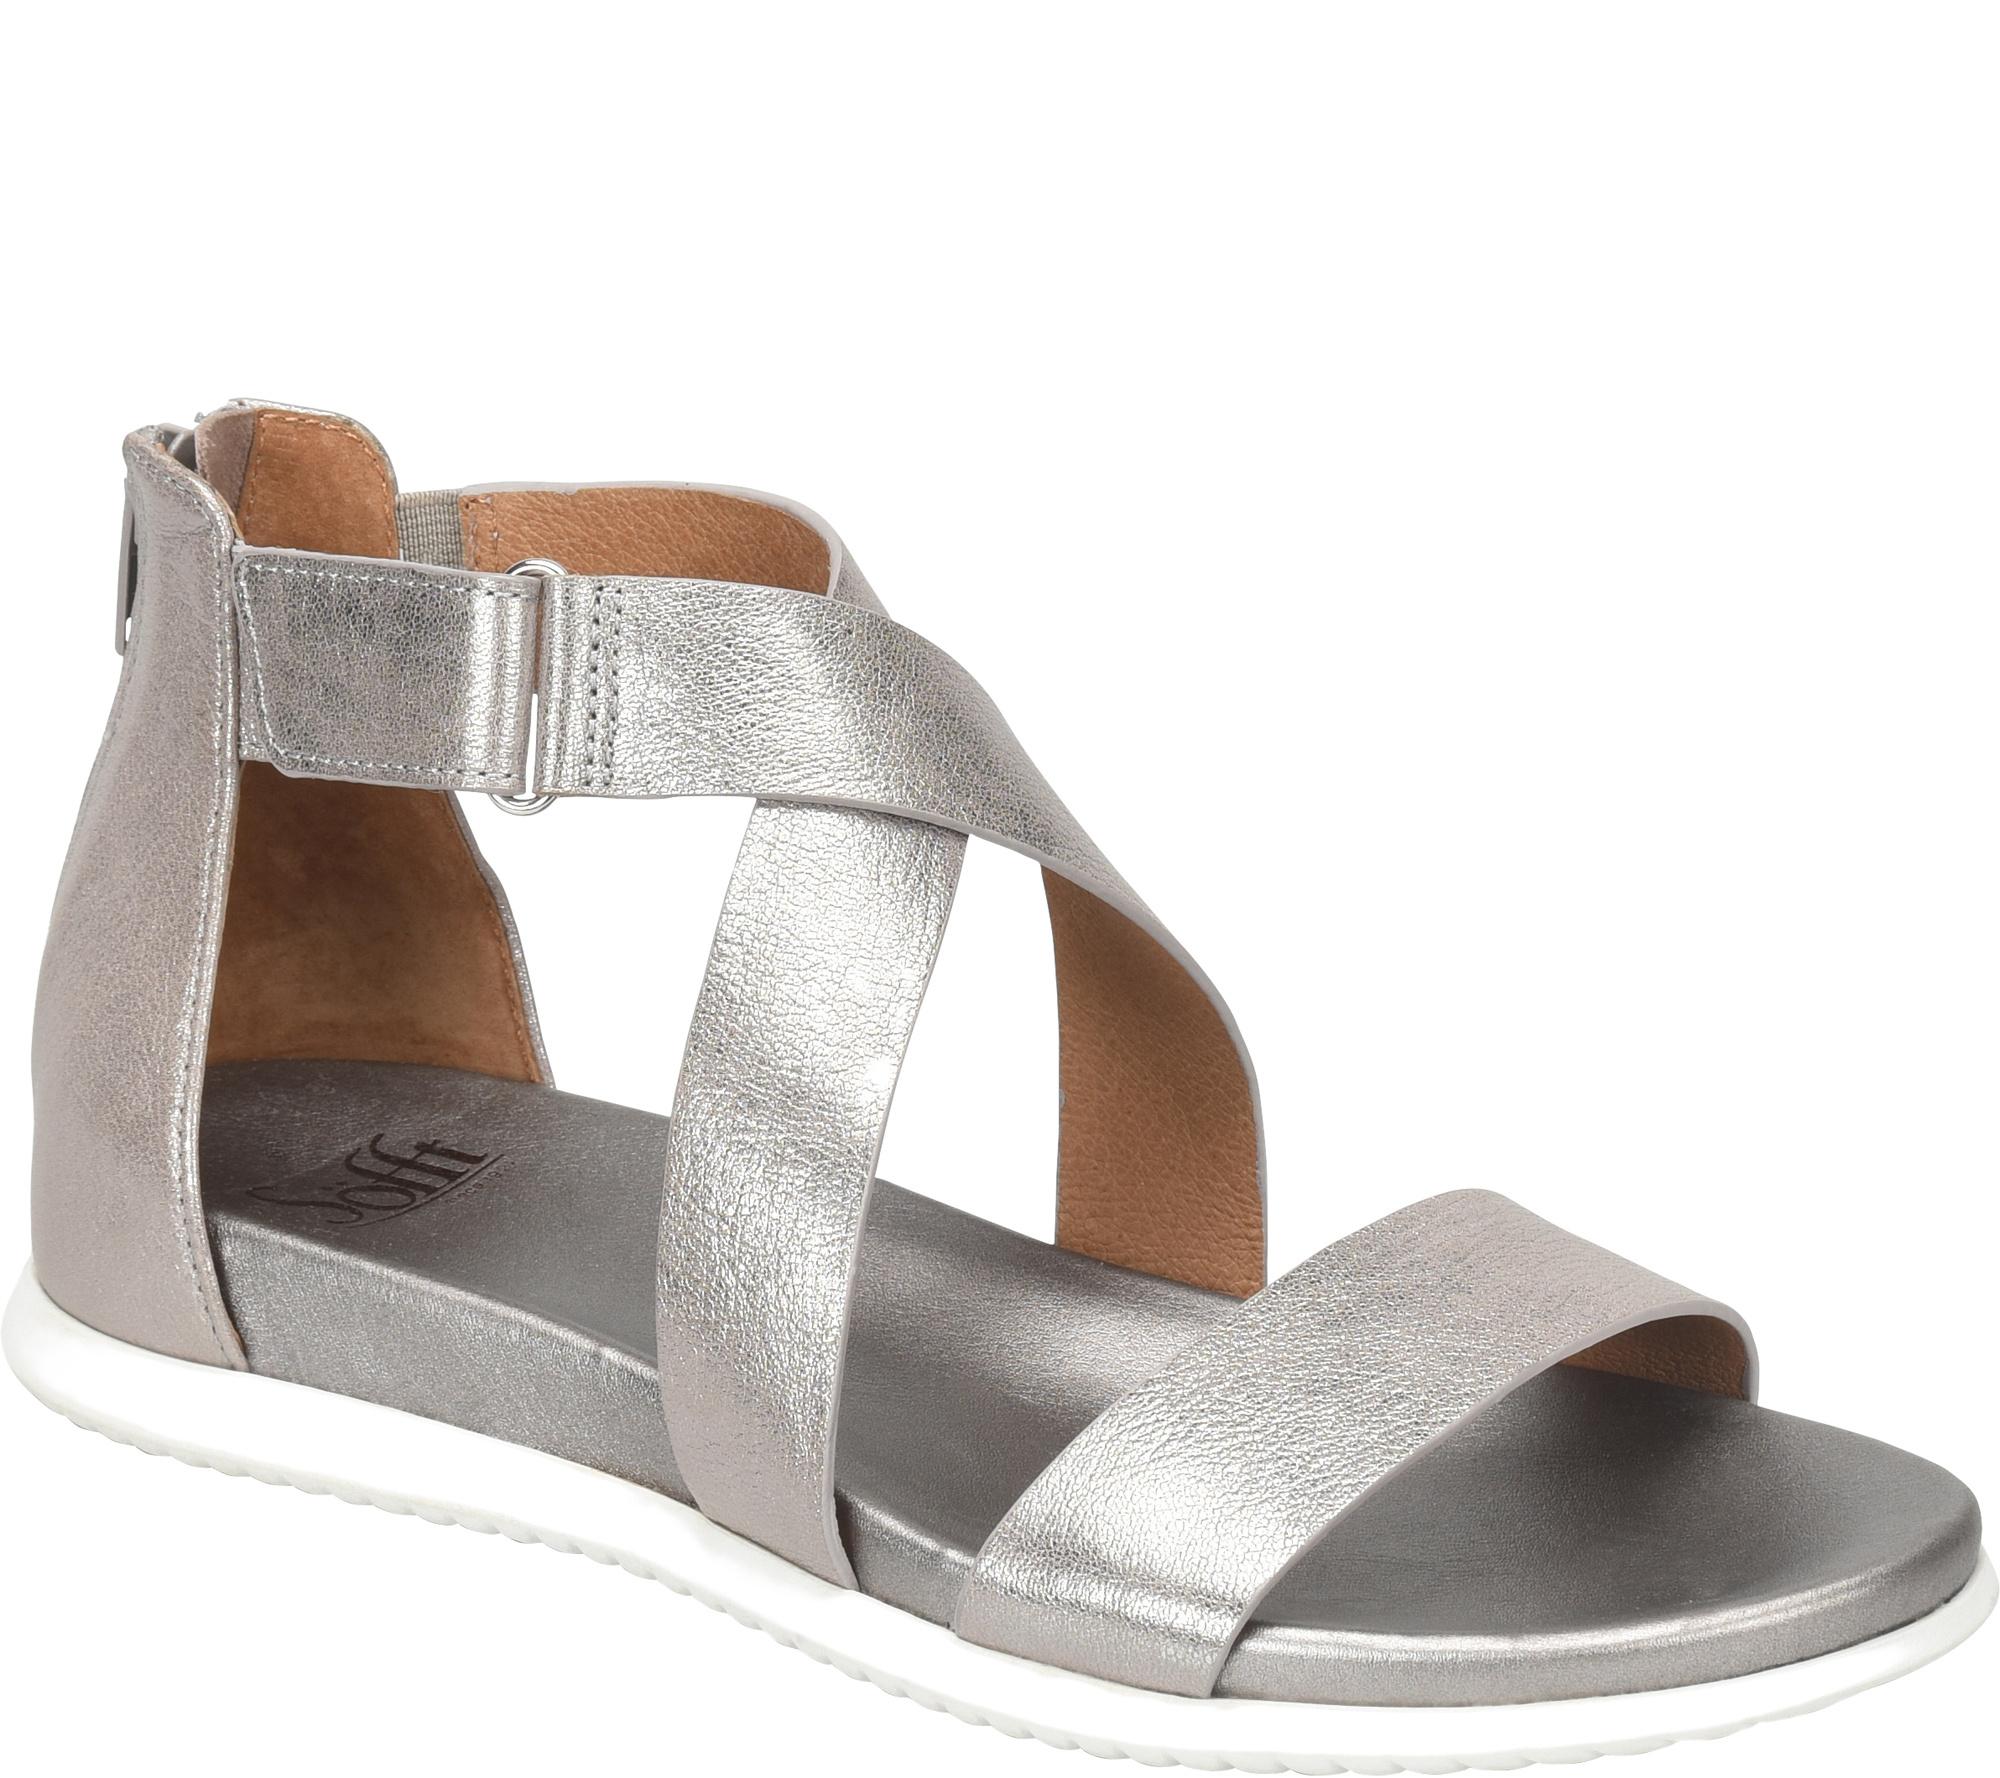 Fiora Leather Sandals